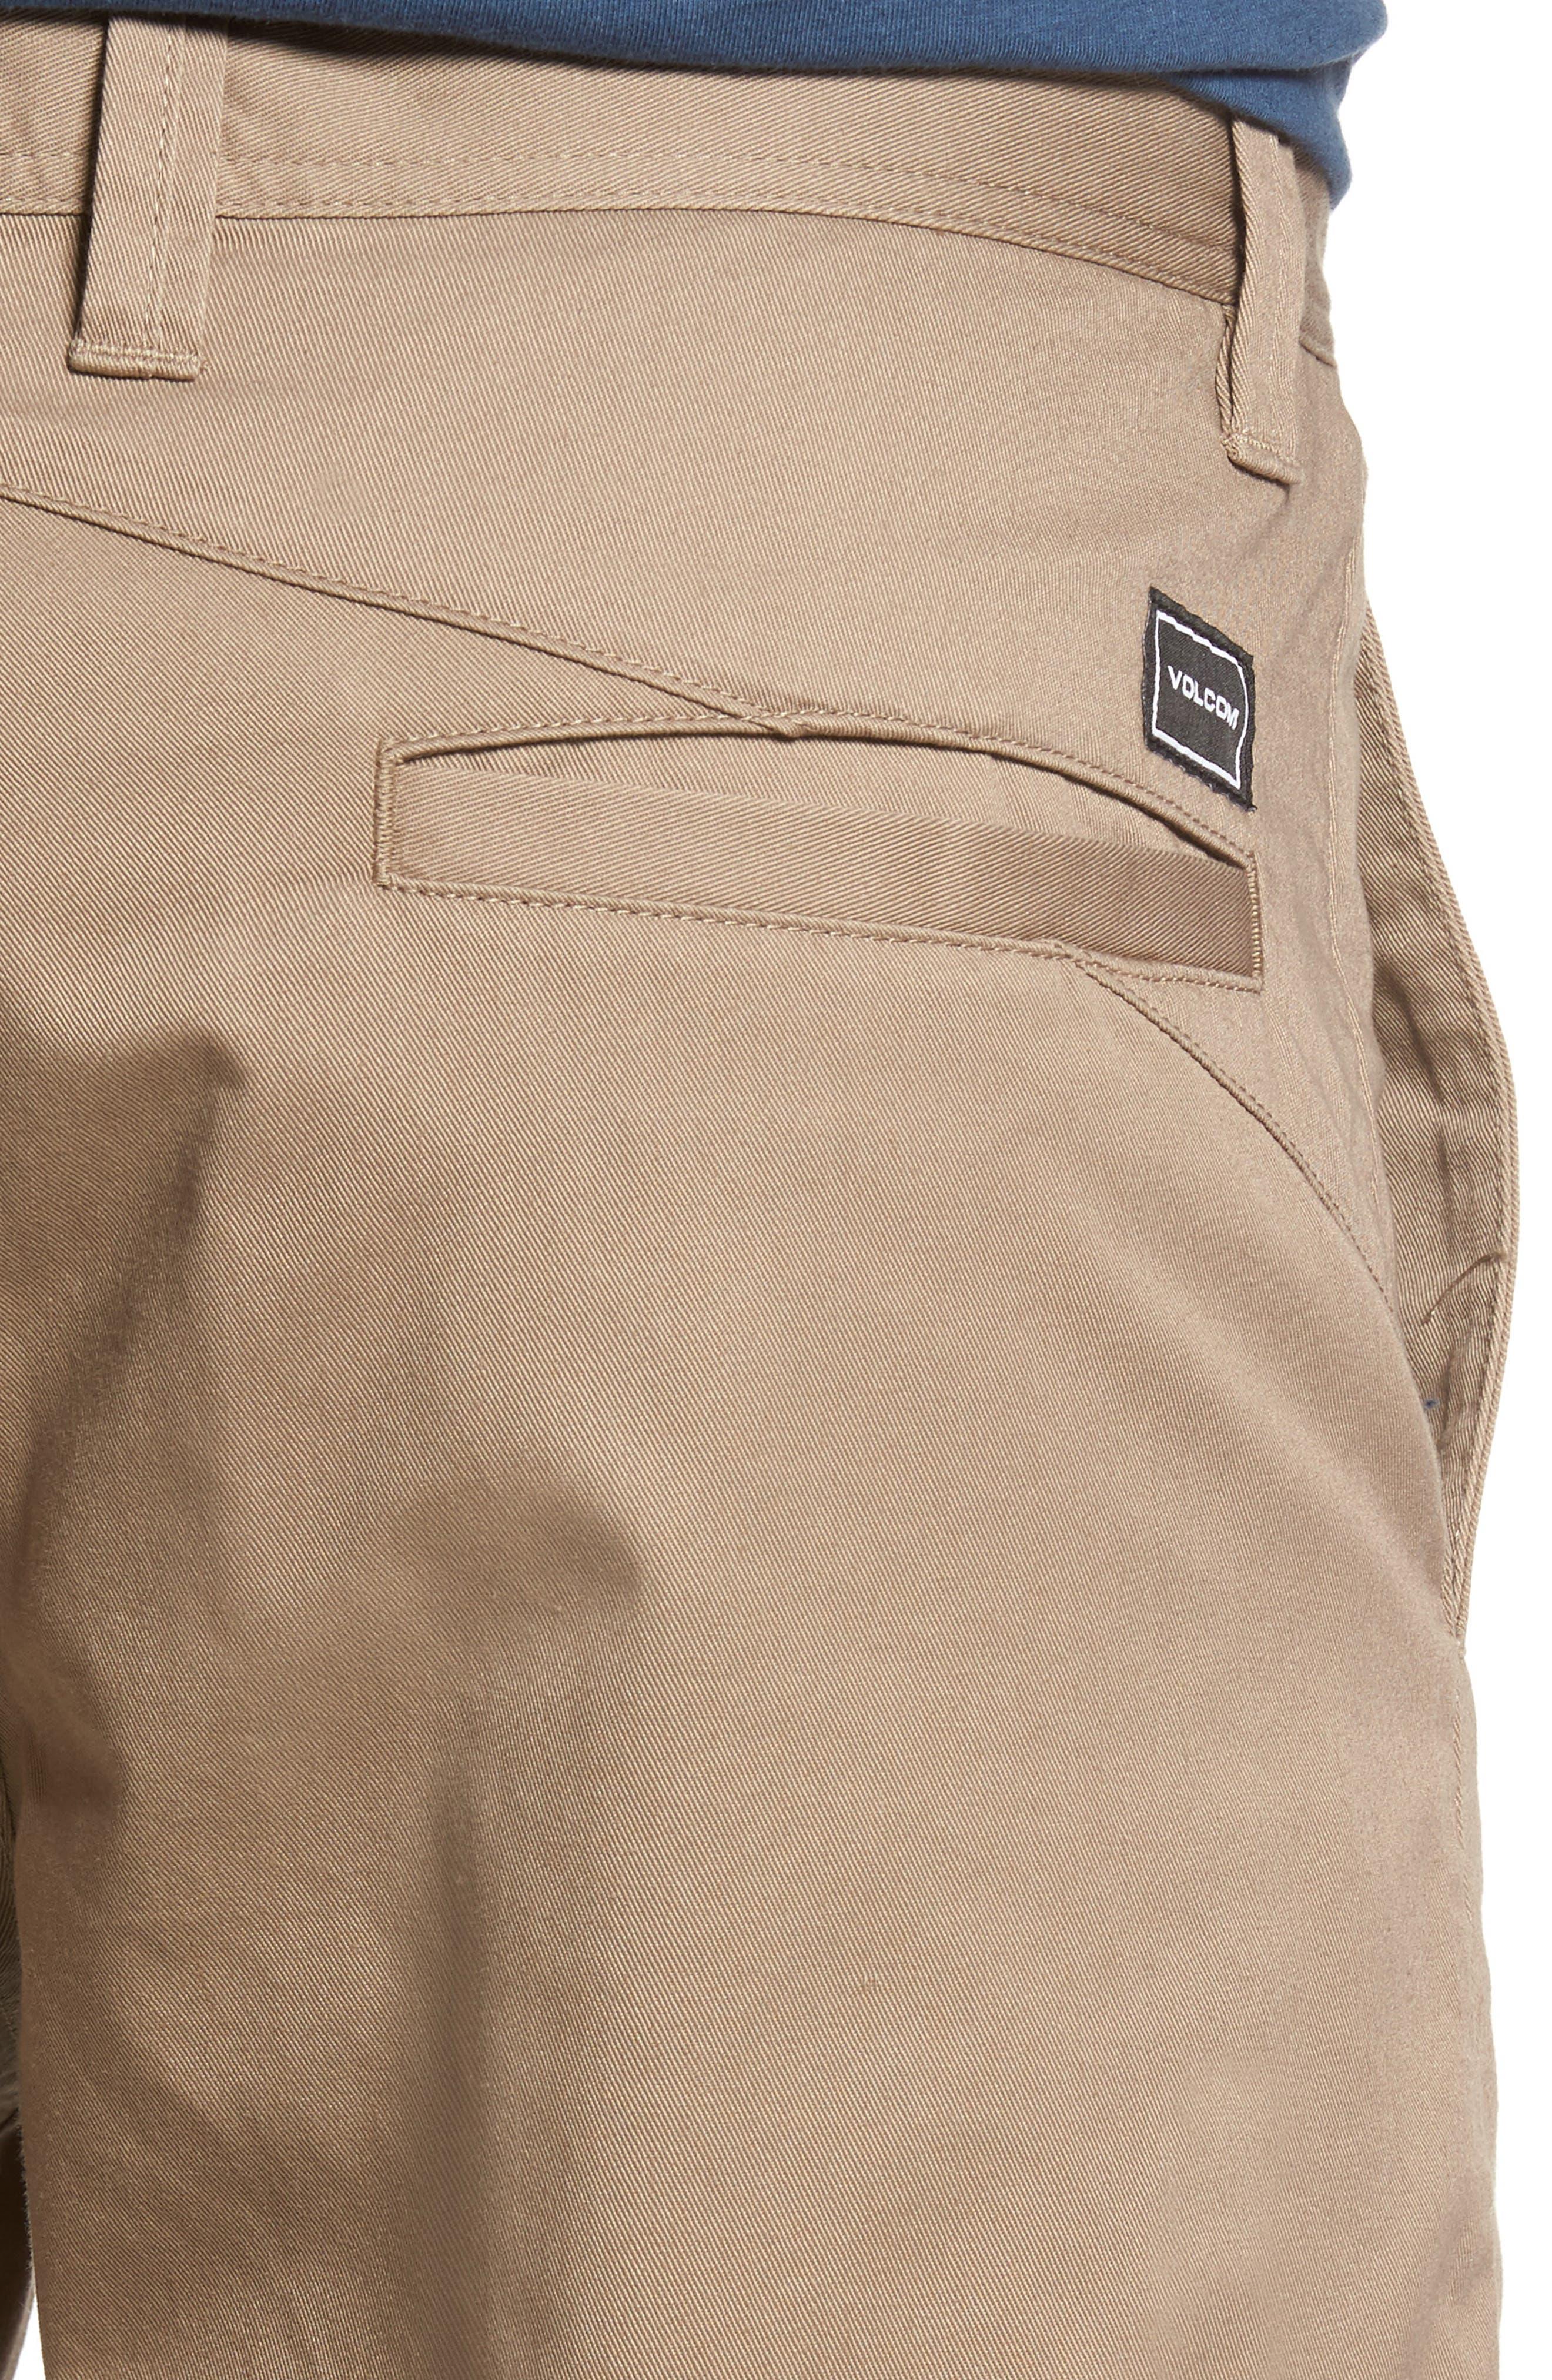 Alternate Image 4  - Volcom Drifter Modern Chino Shorts